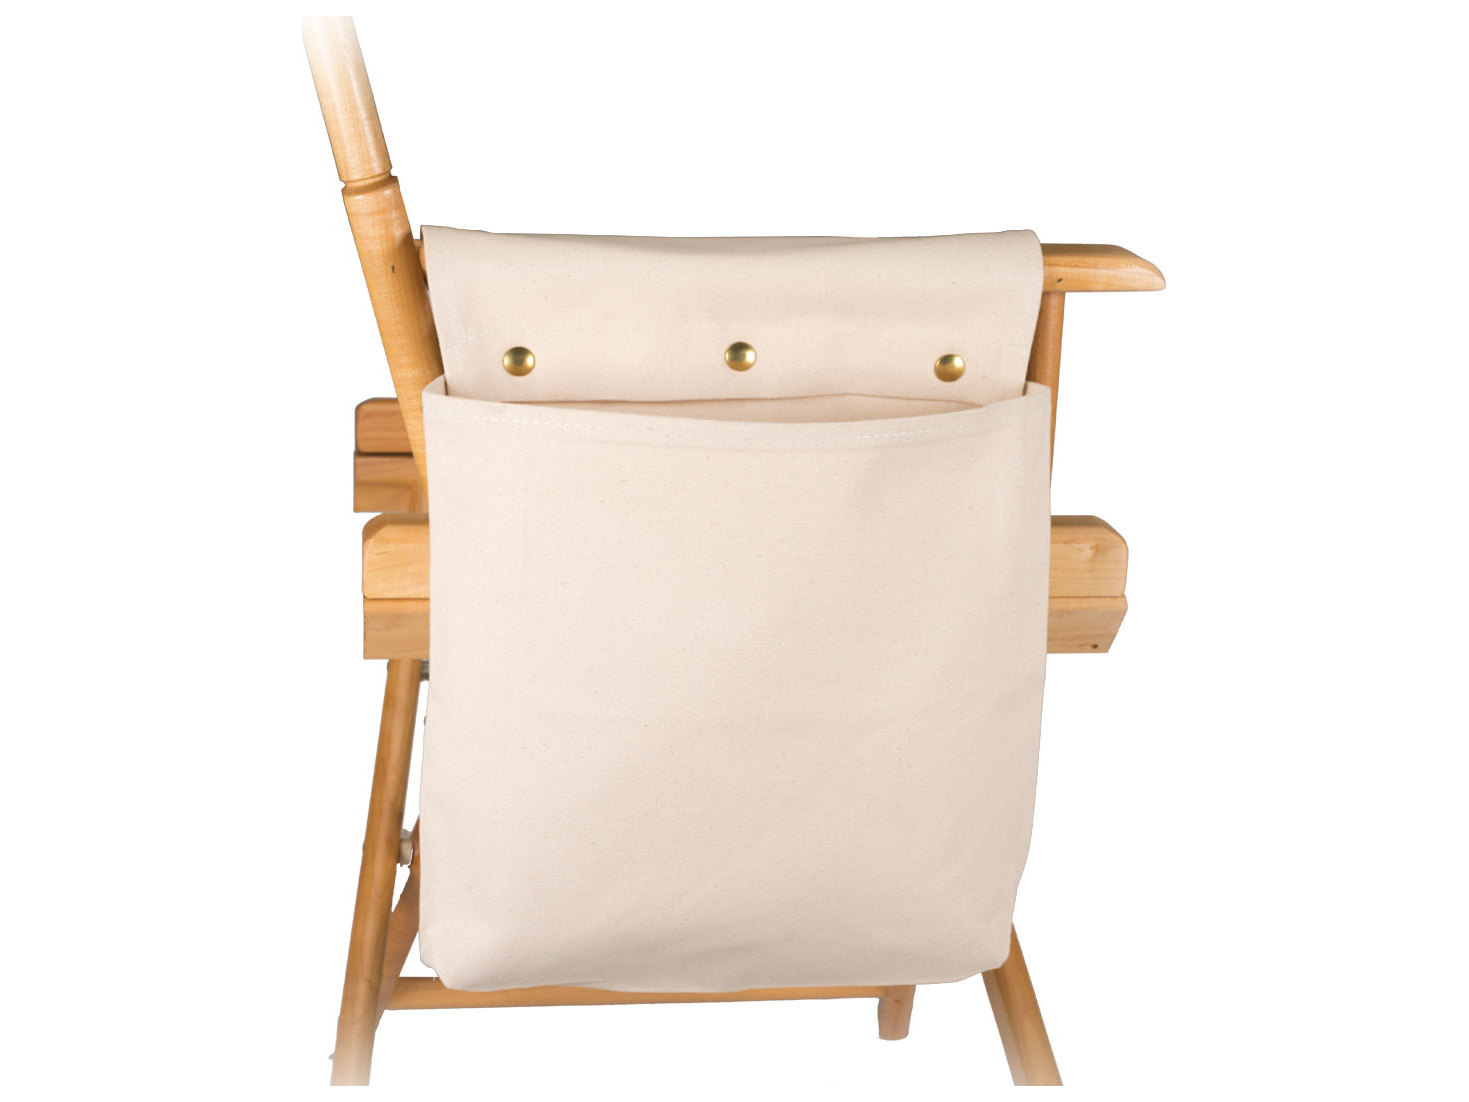 Telescope Casual Director Chair Canvas Script Bags 1bag